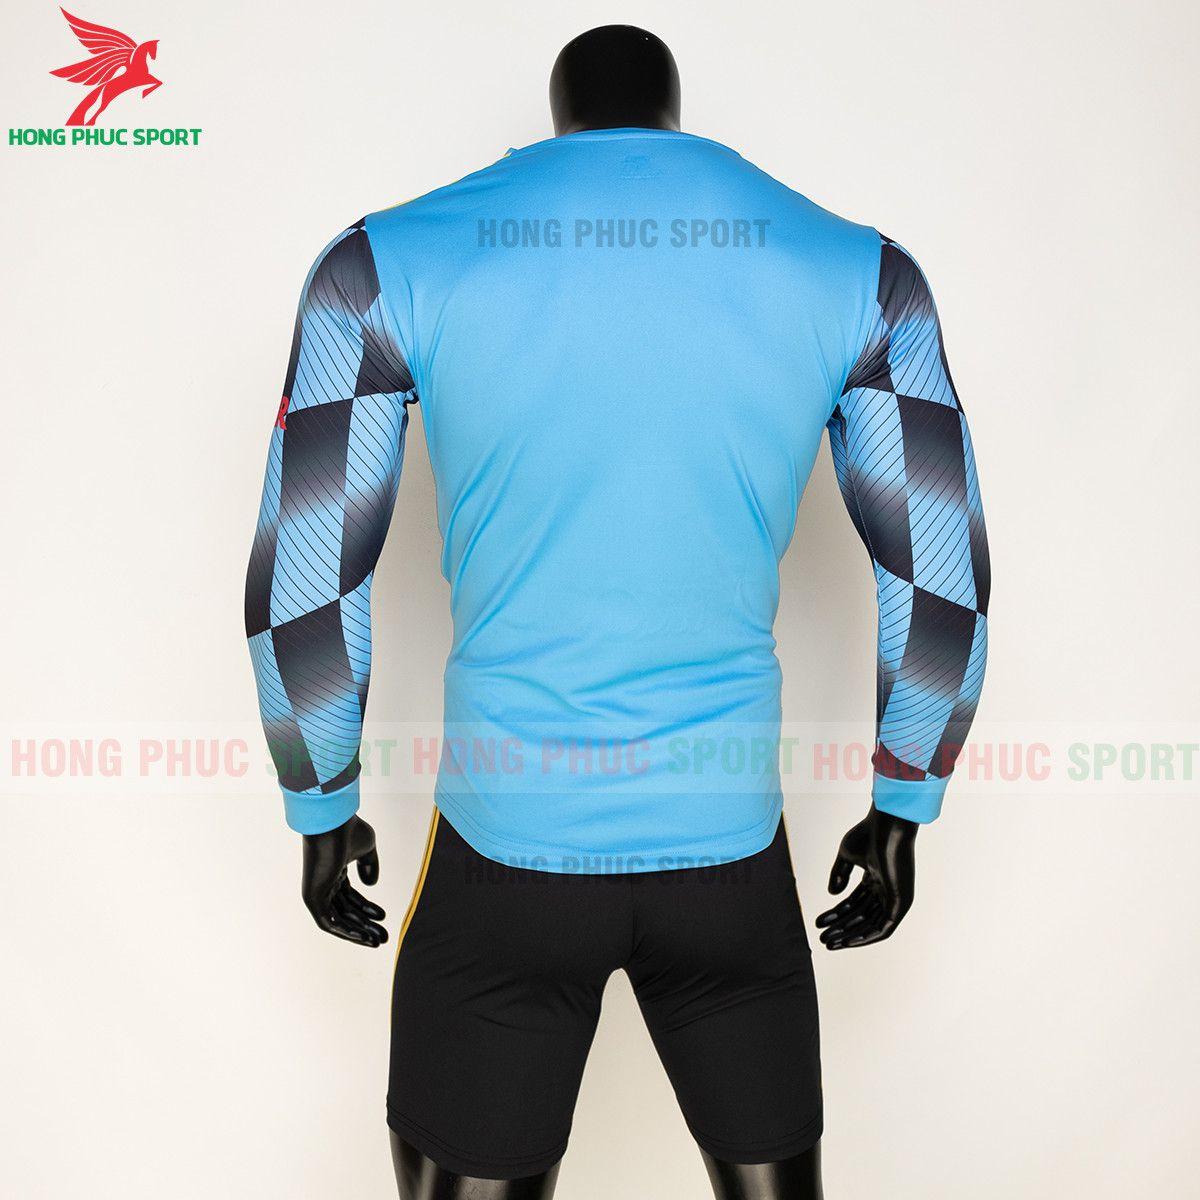 https://cdn.hongphucsport.com/unsafe/s4.shopbay.vn/files/285/ao-bong-da-mu-dai-tay-2021-22-mau-thu-3-thun-lanh-615d4f8d9b3ec.jpg